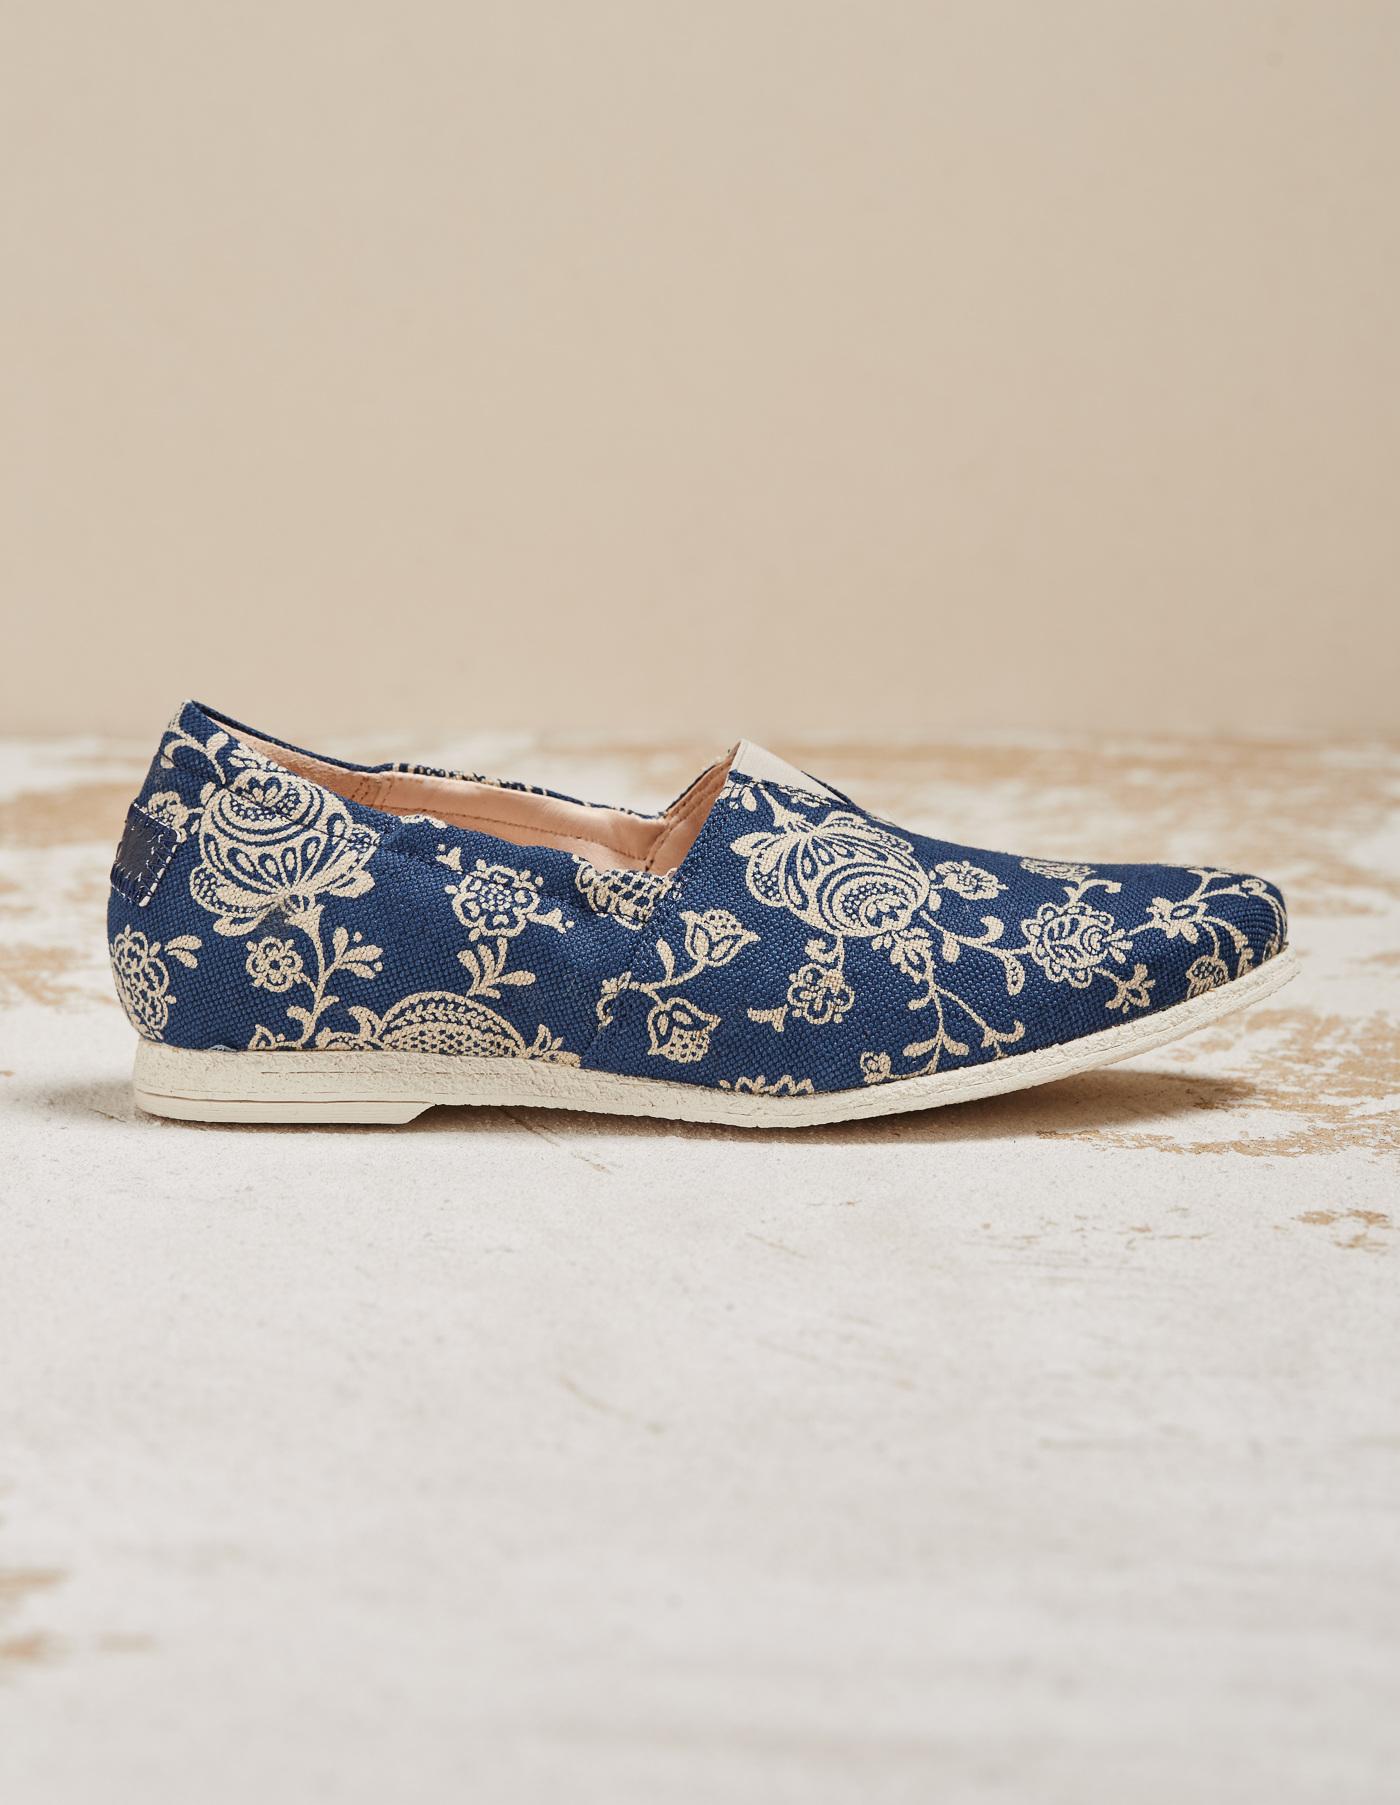 sneakers for cheap 59818 d77fc Damenschuhe Größe 43 - leben auf großem Fuß - Deerberg Blog